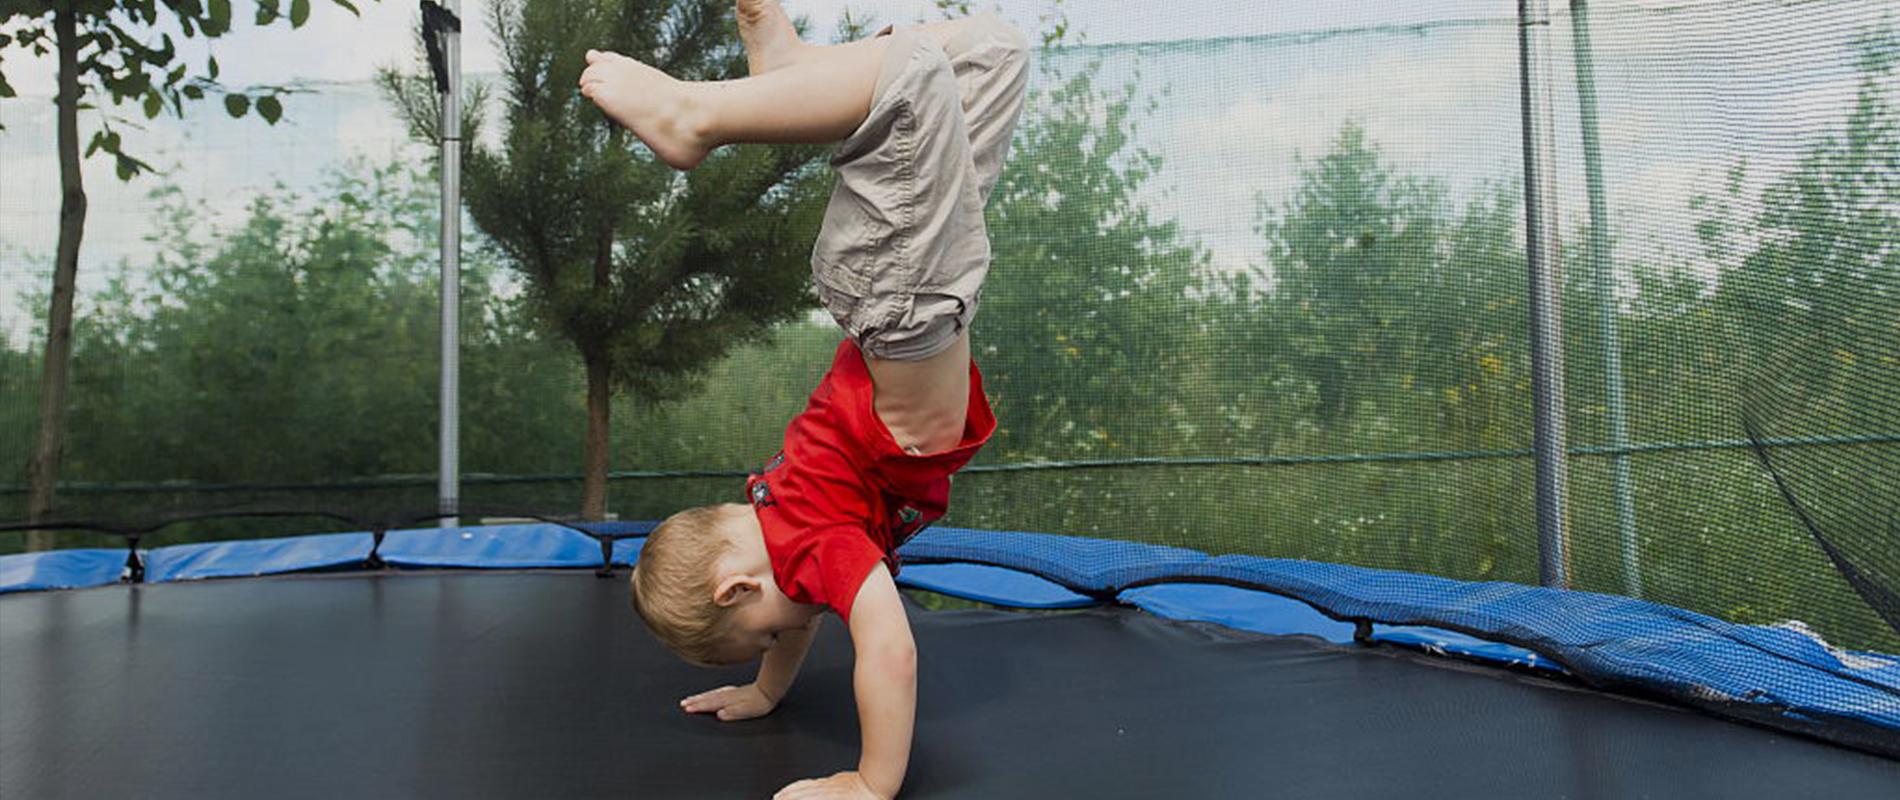 trampoline games for kids